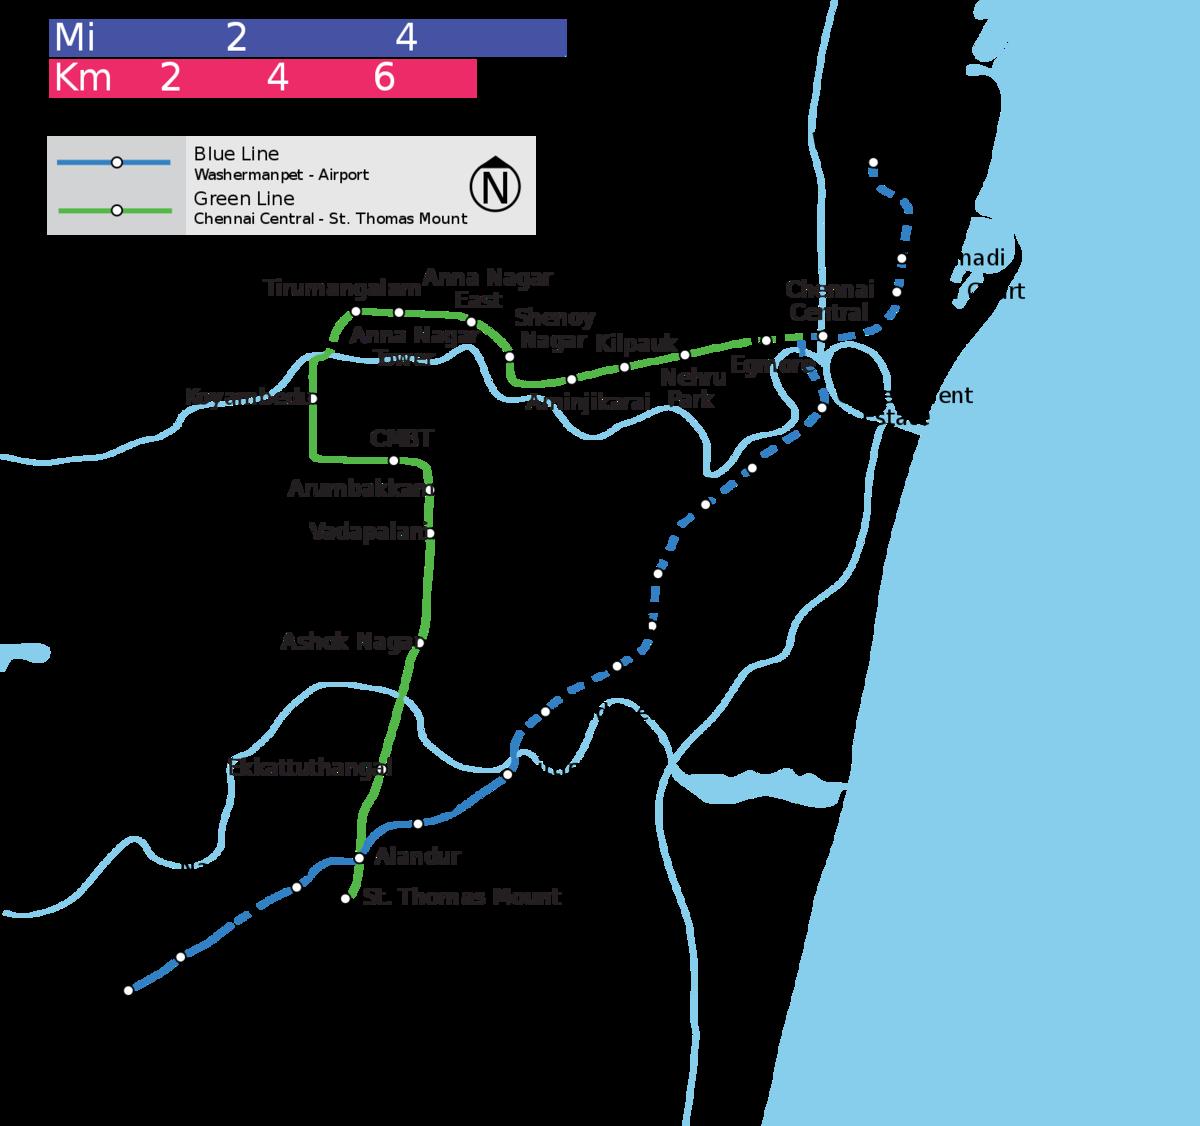 Schematic diagram of Chennai Metro